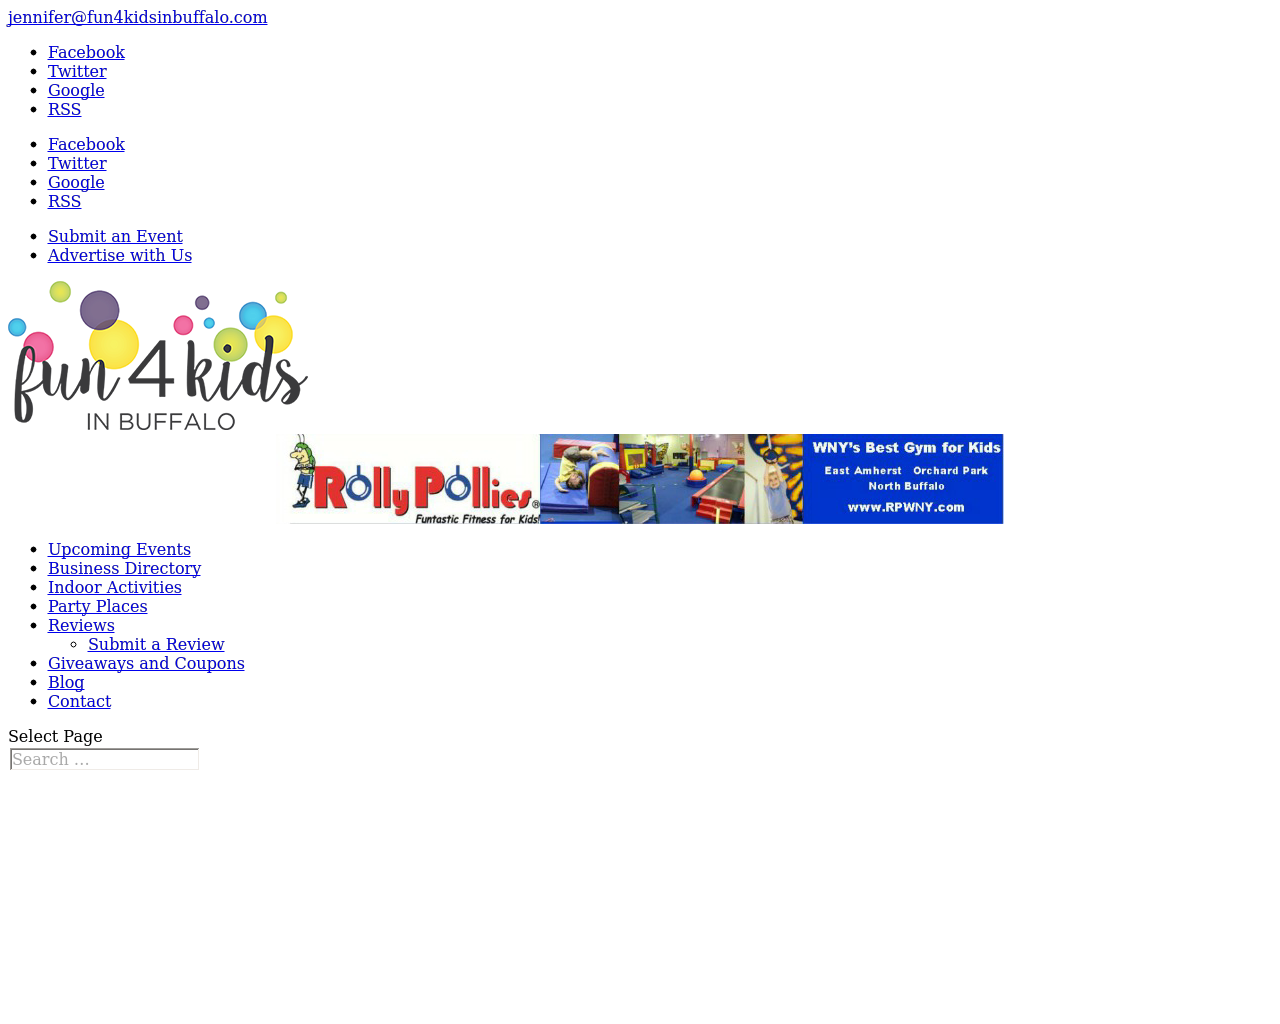 Fun4kidsinbuffalo.com-Advertising-Reviews-Pricing